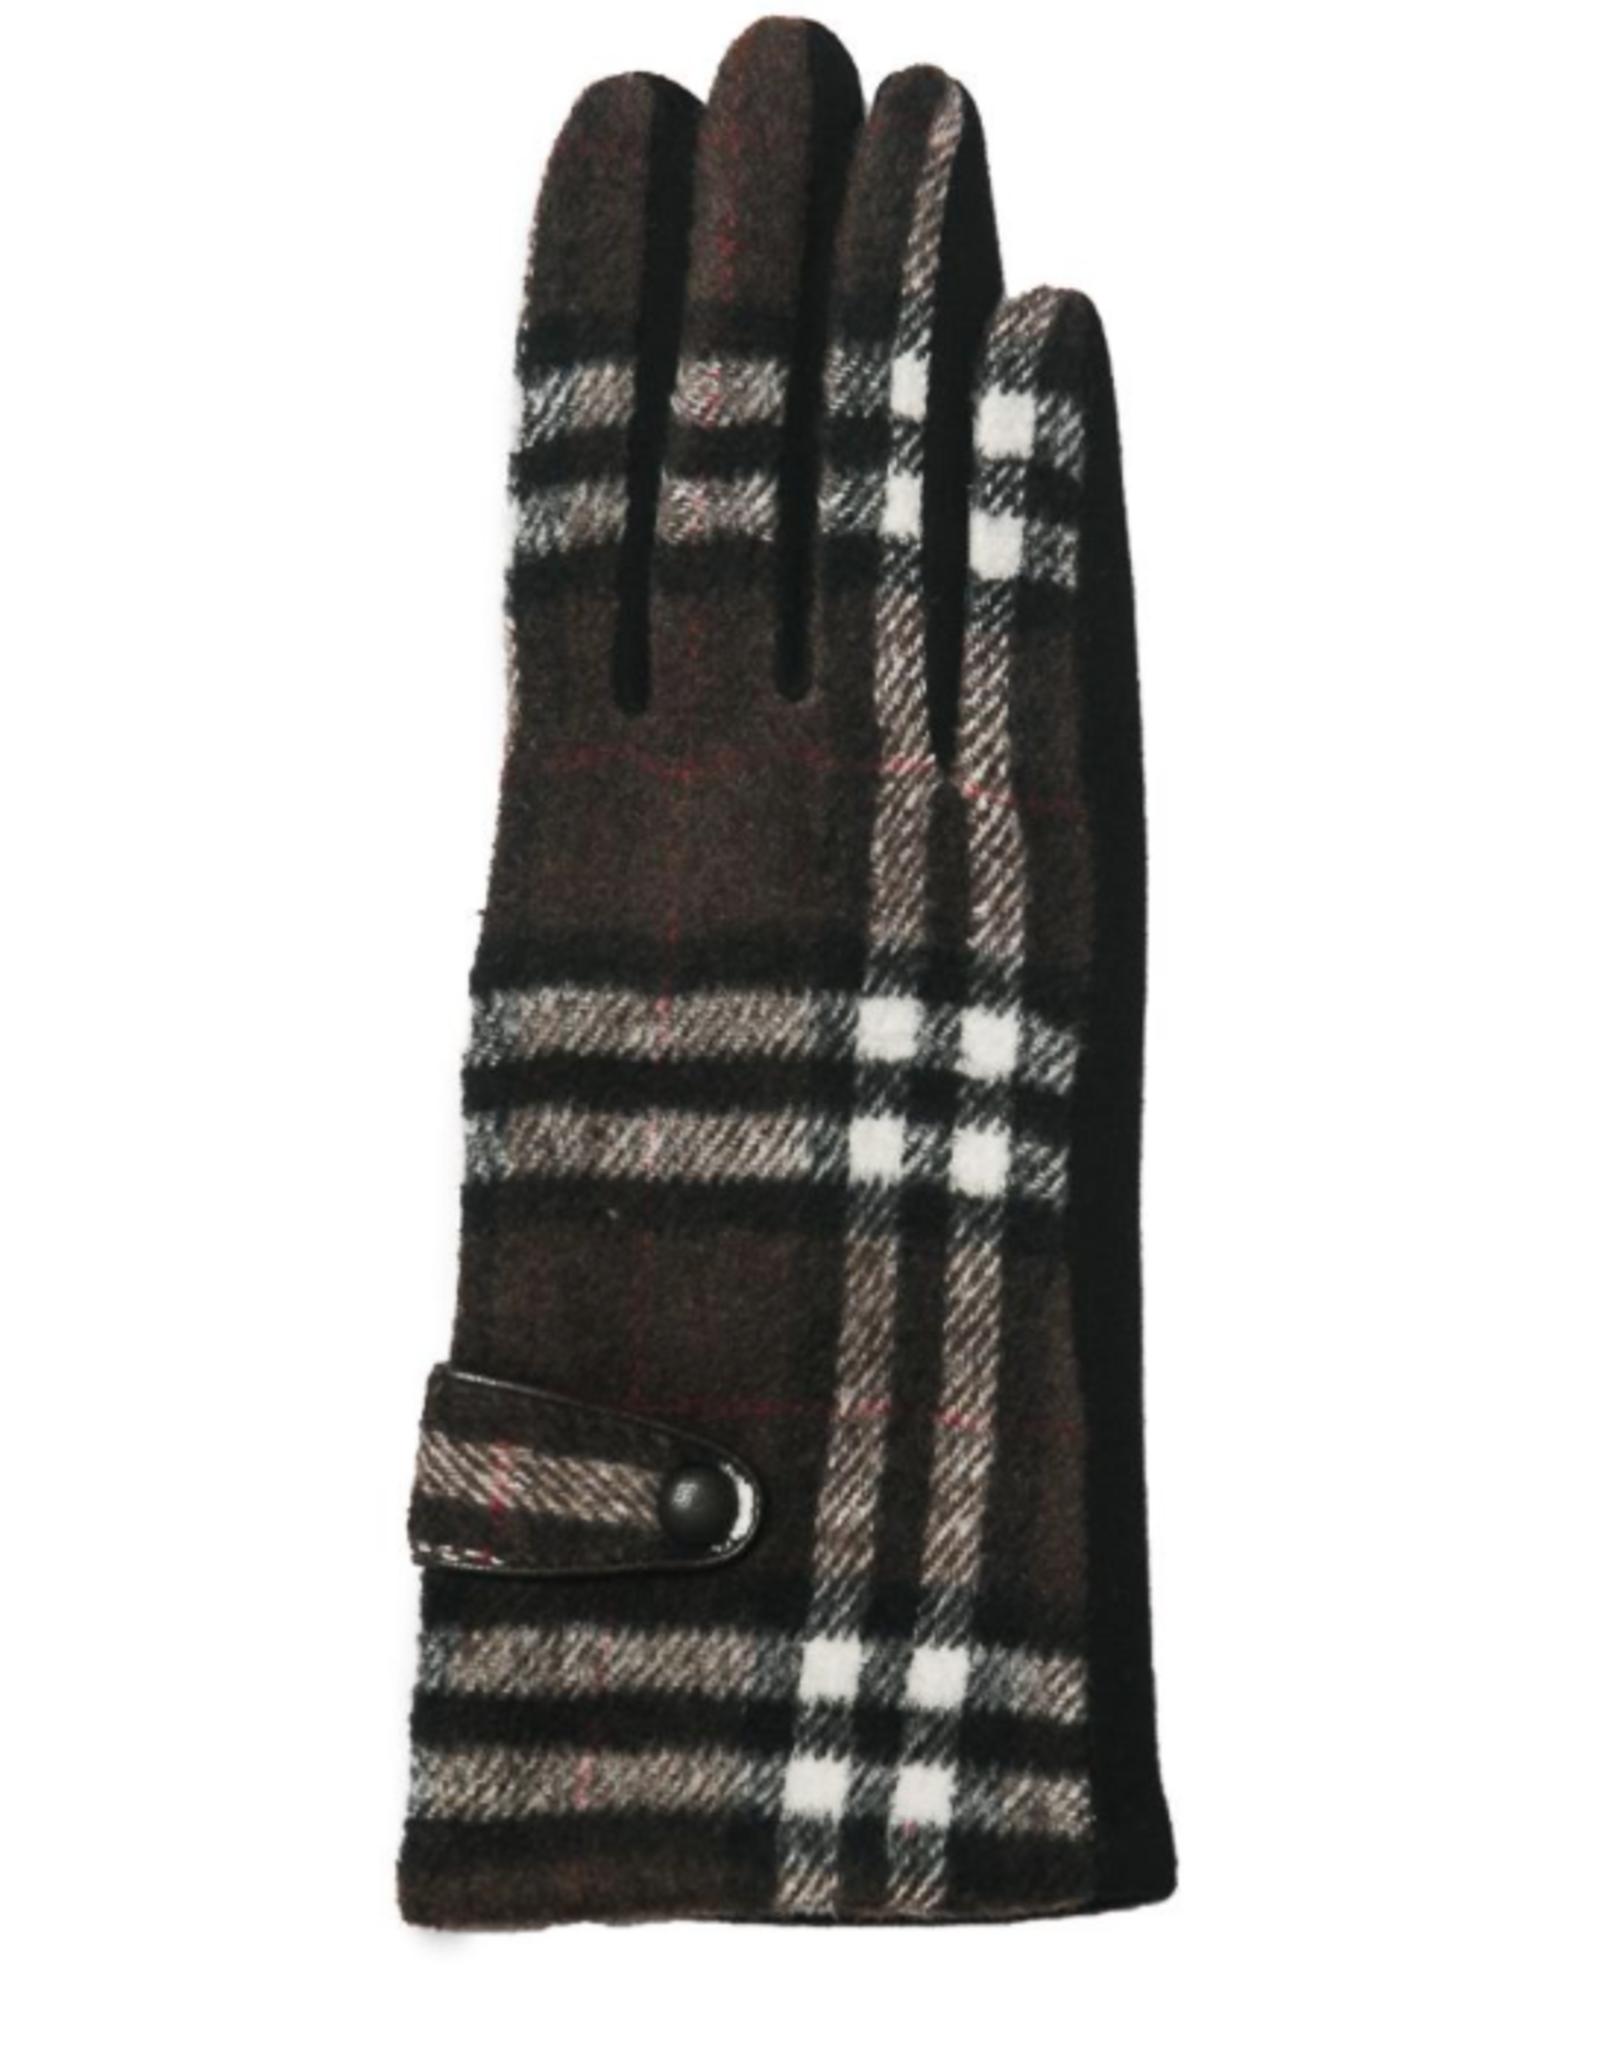 TOP IT OFF Brooklyn Gloves - Brown Plaid